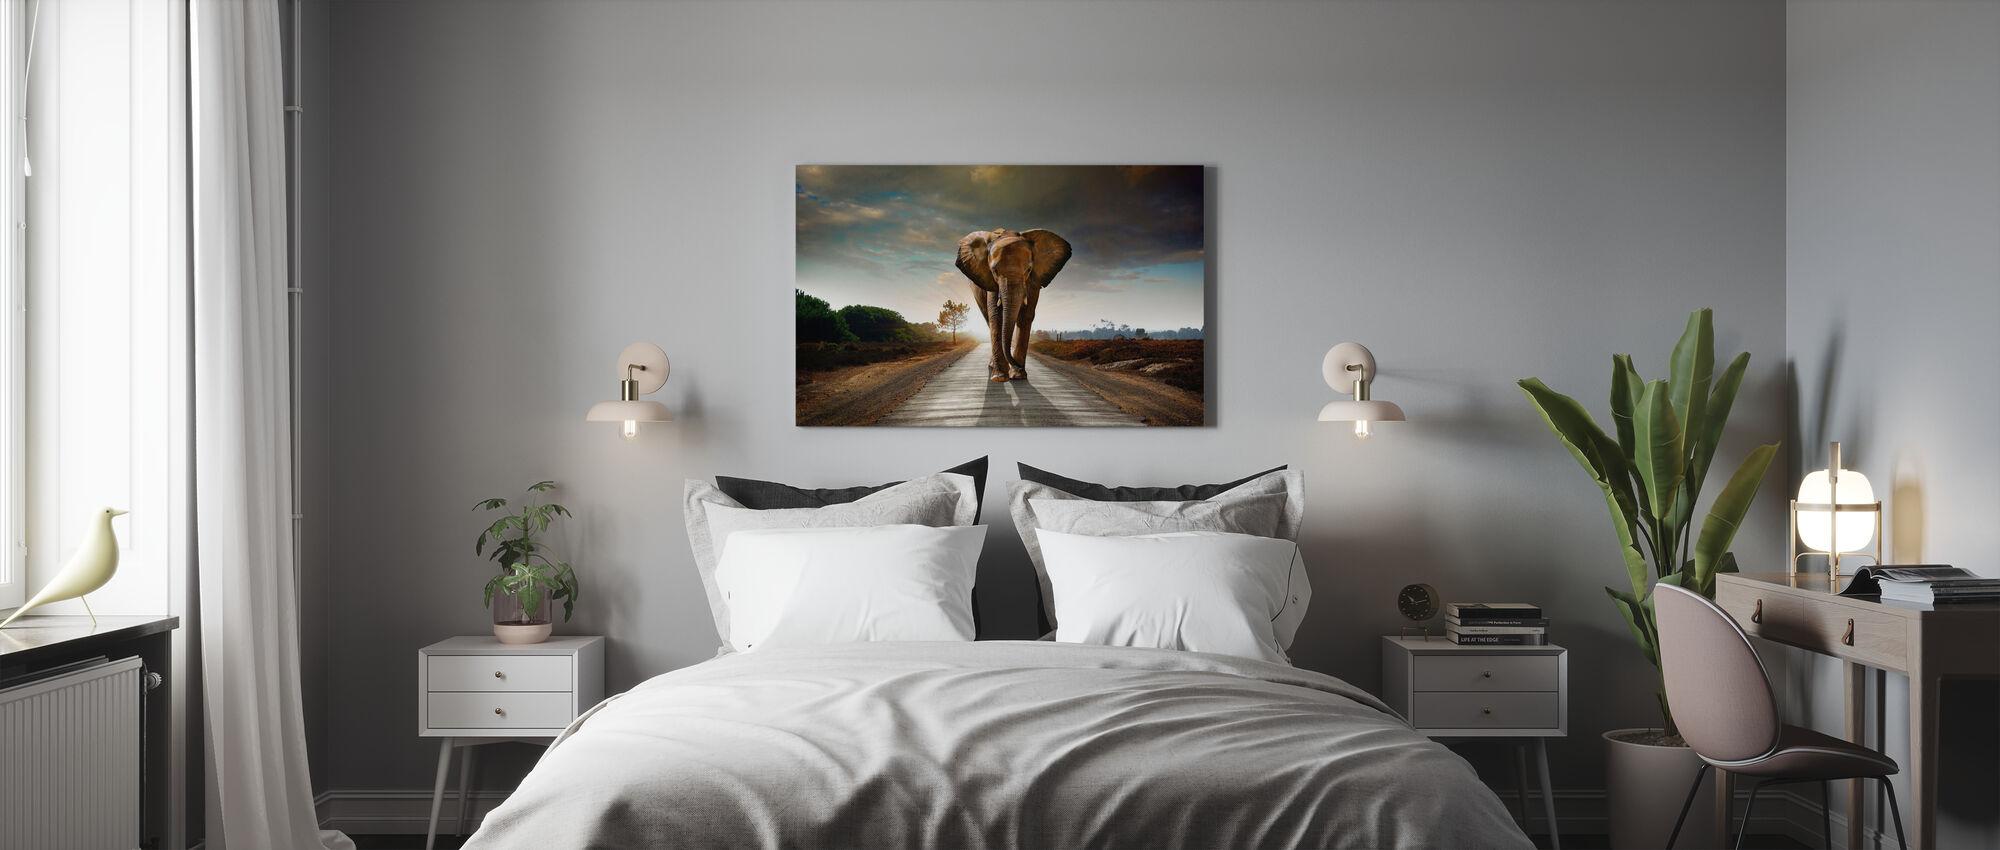 Elefantväg - Canvastavla - Sovrum